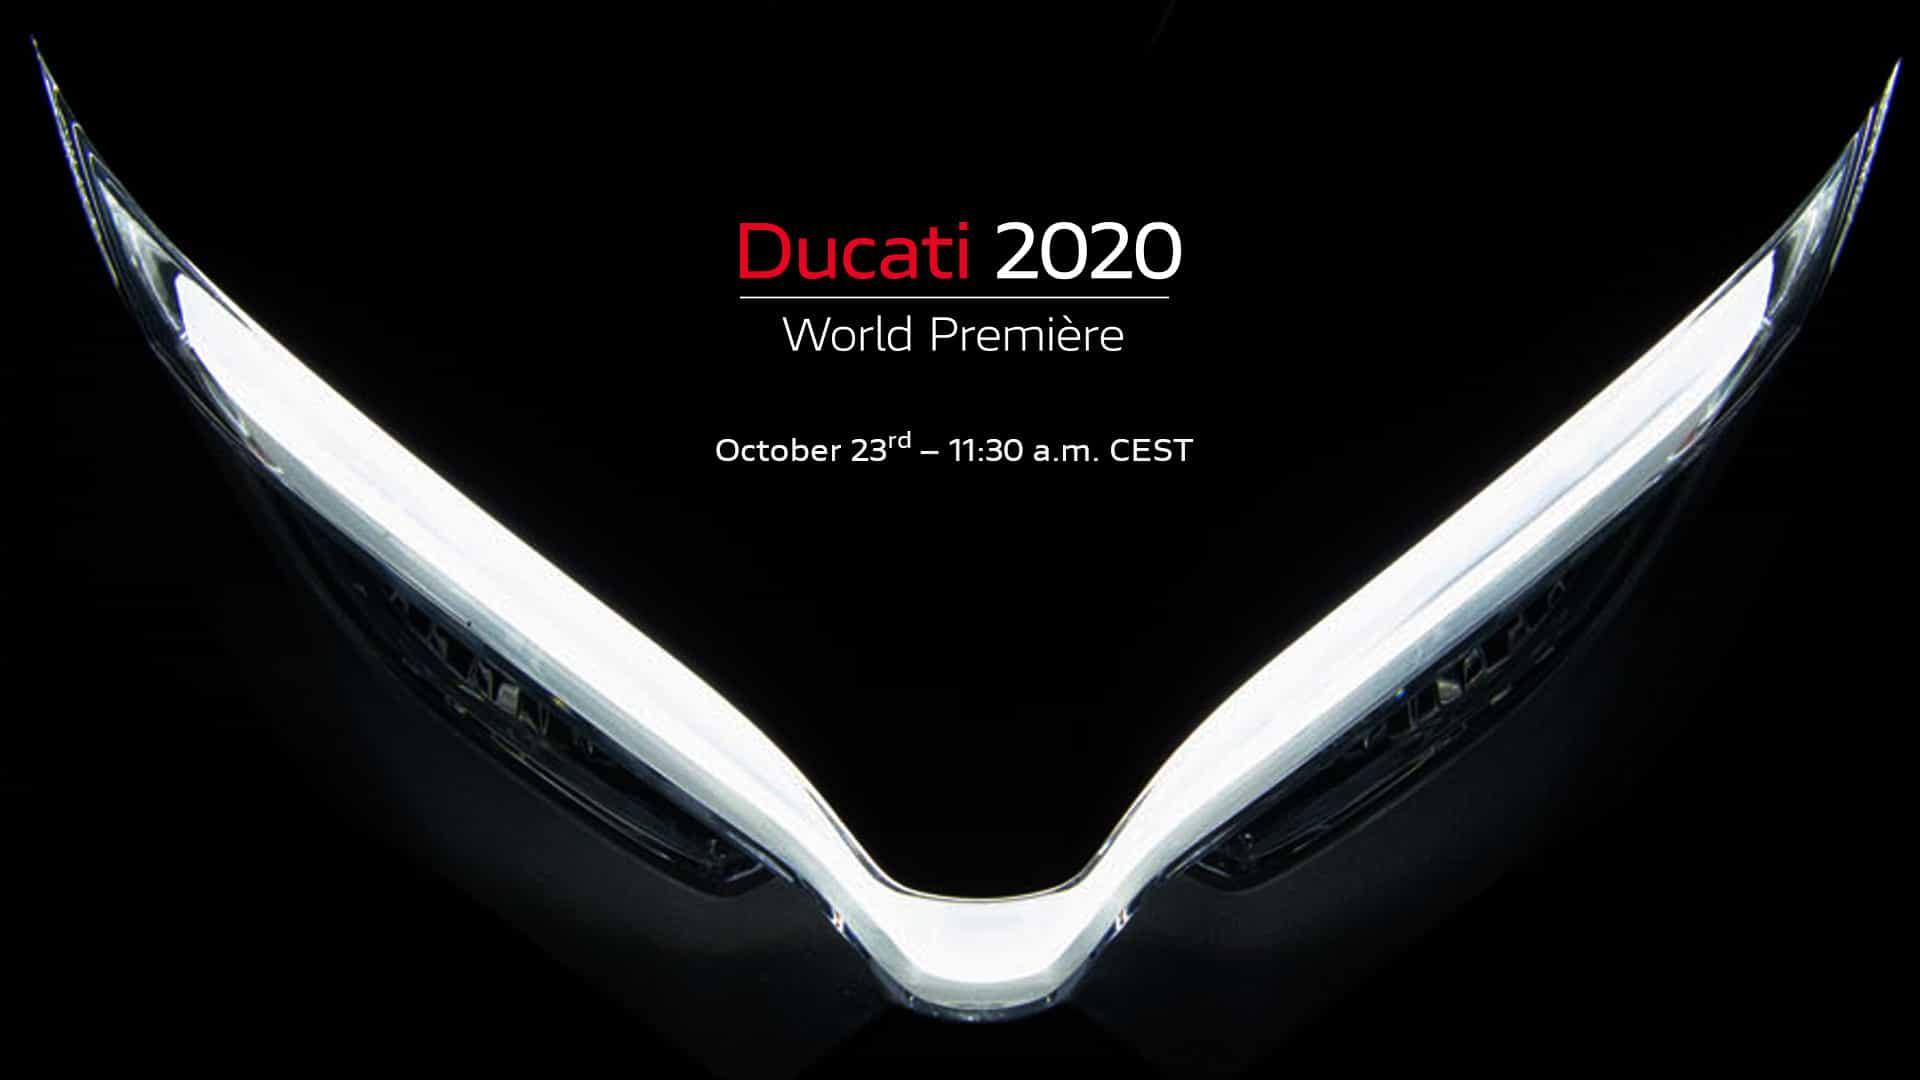 Ducati 新型モデル発表の舞台 Ducatiワールドプレミアは10月23日